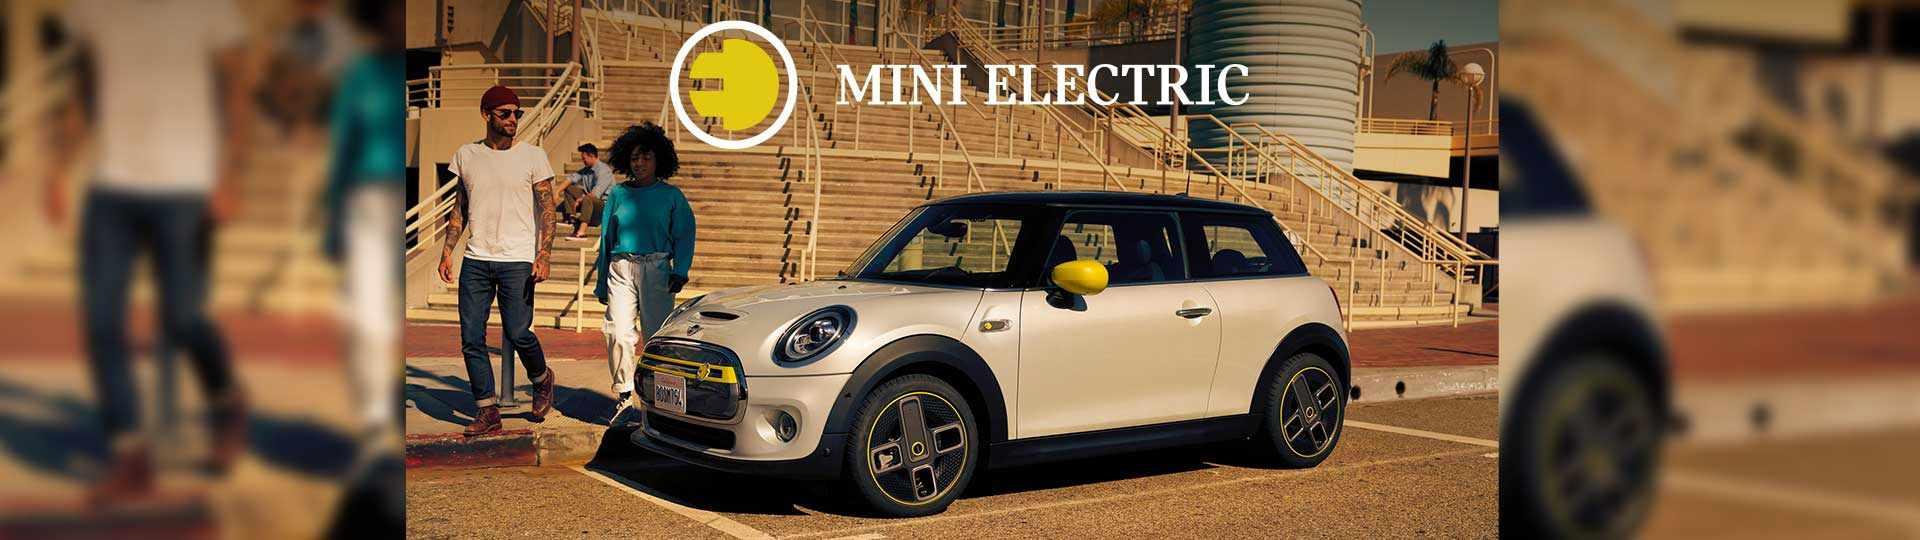 header_mini_electric.jpg